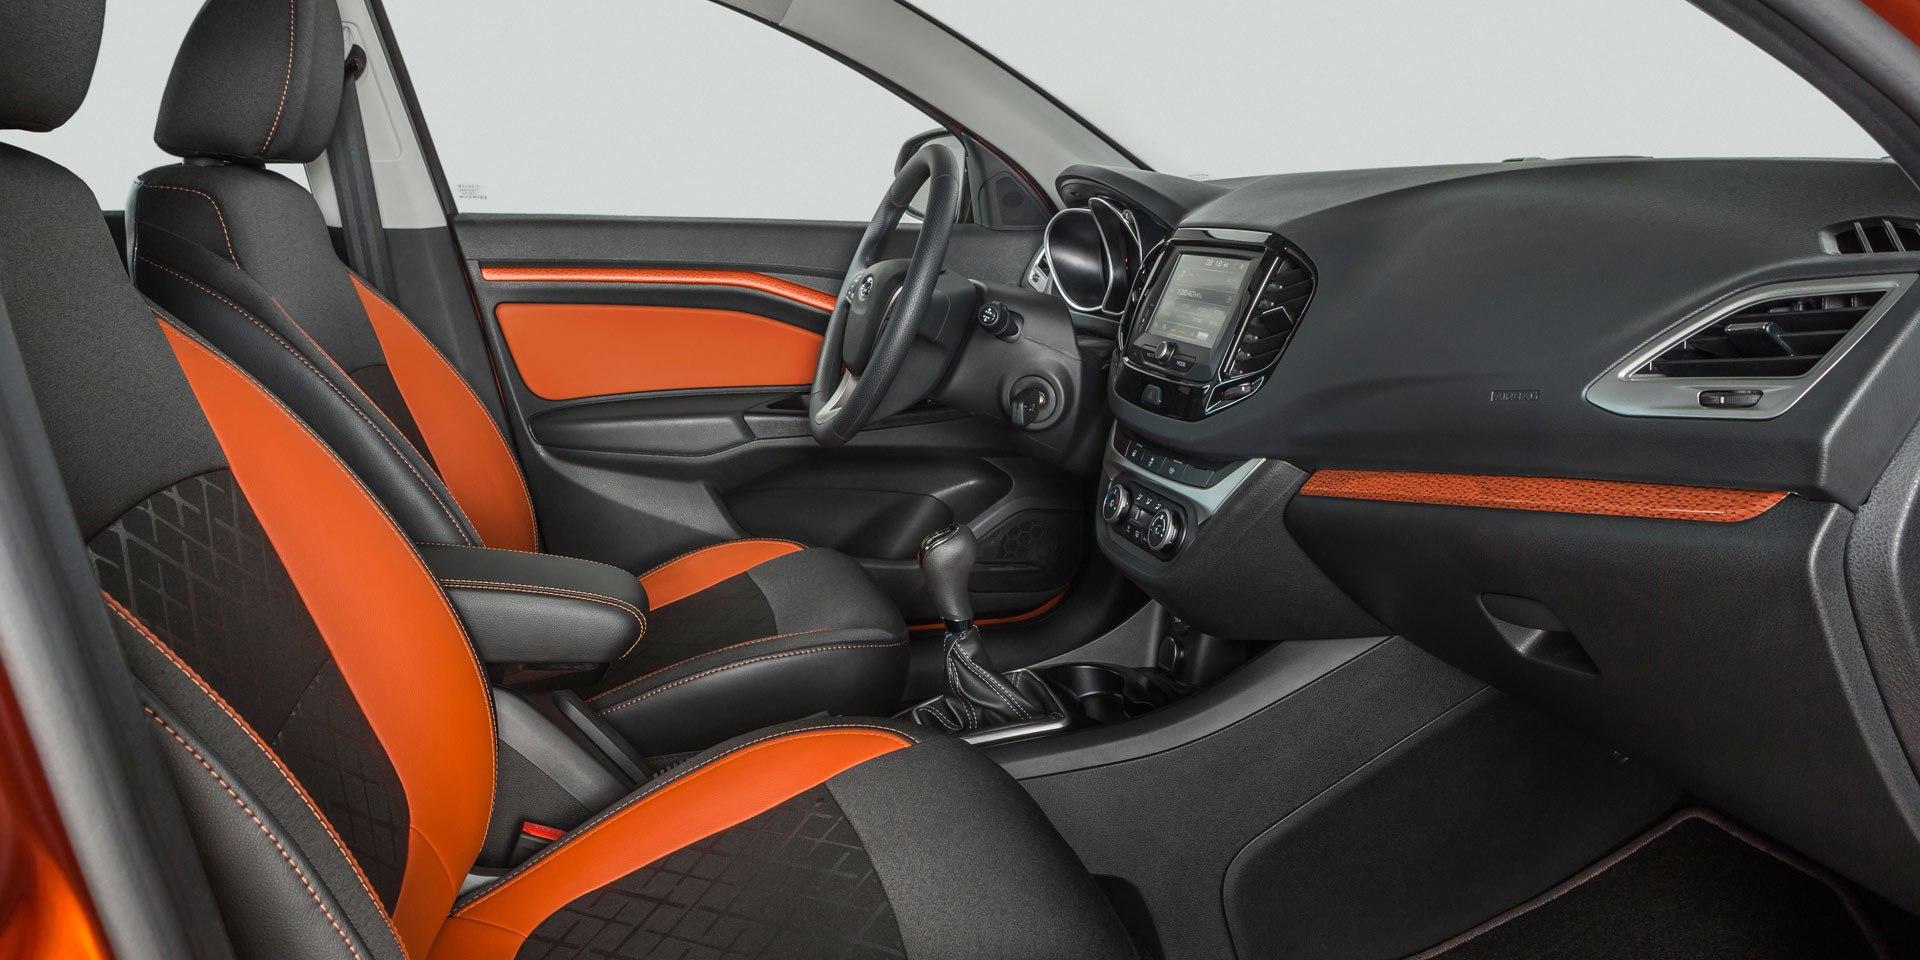 Новые модели ВАЗ 2019: фото, цена и характеристики авто, новинки Лада, старт продаж в России